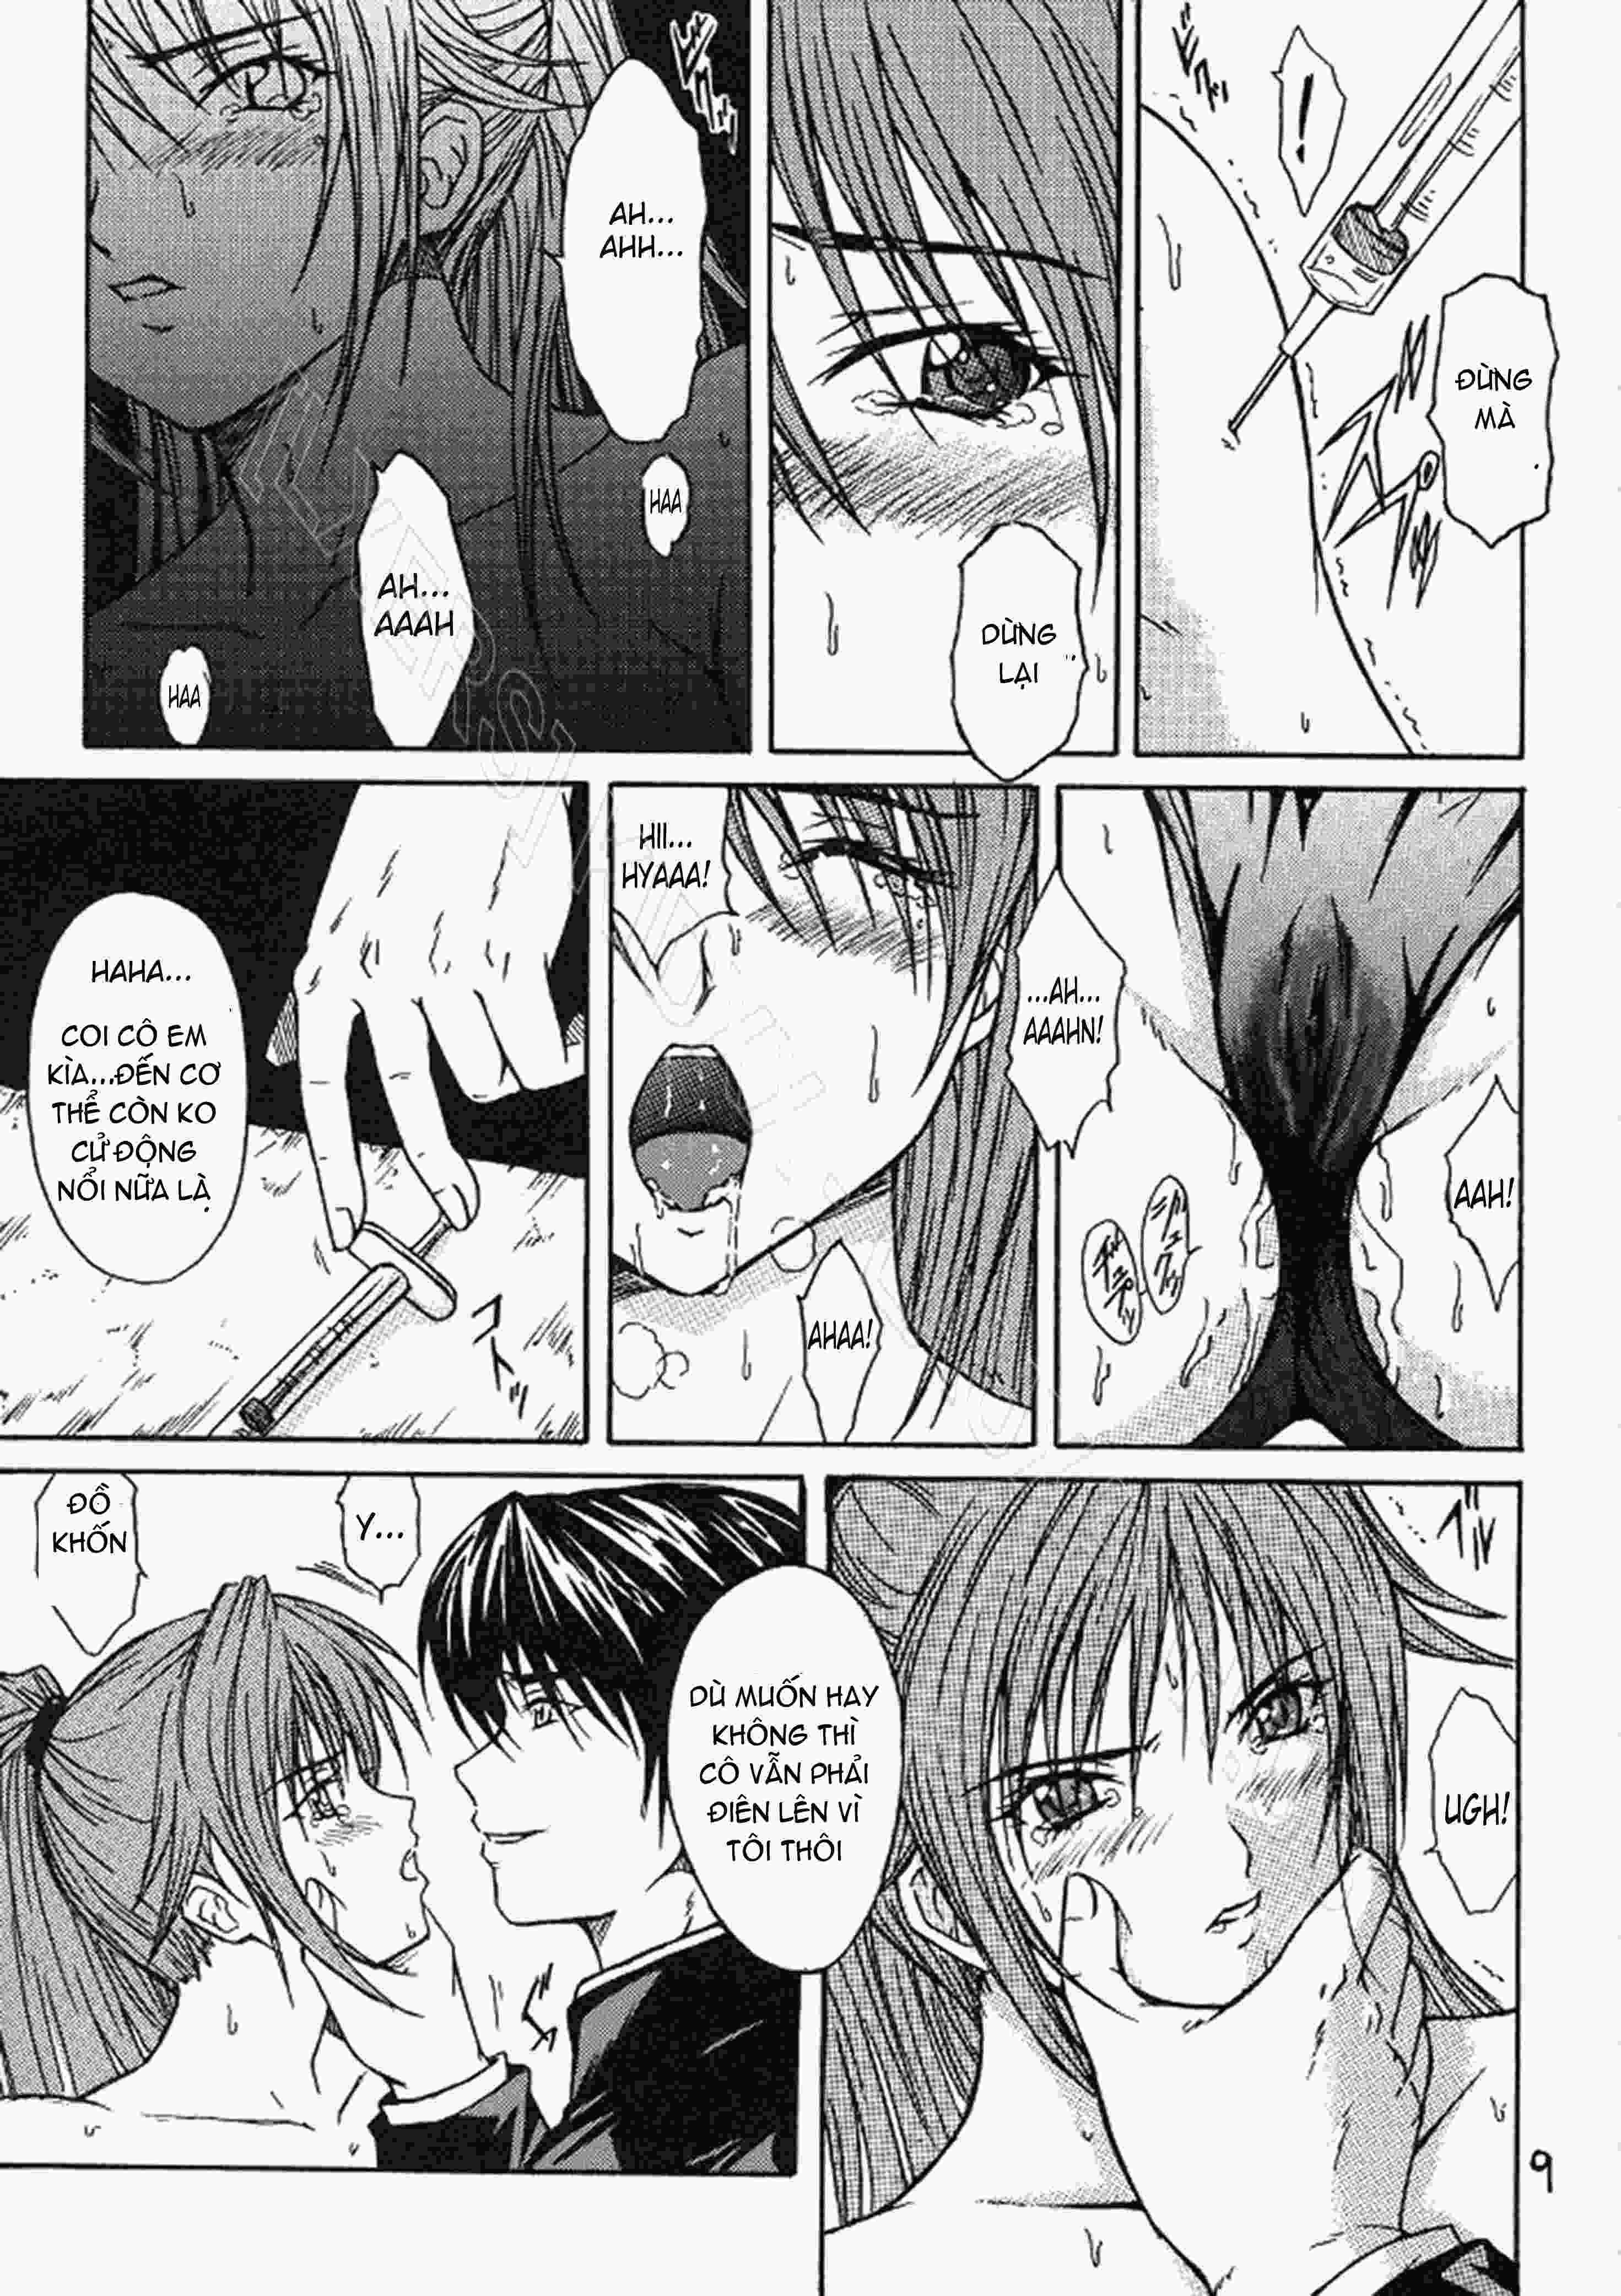 TruyenHay.Com - Ảnh 8 - Ryoujoku Rensa Chapter 1